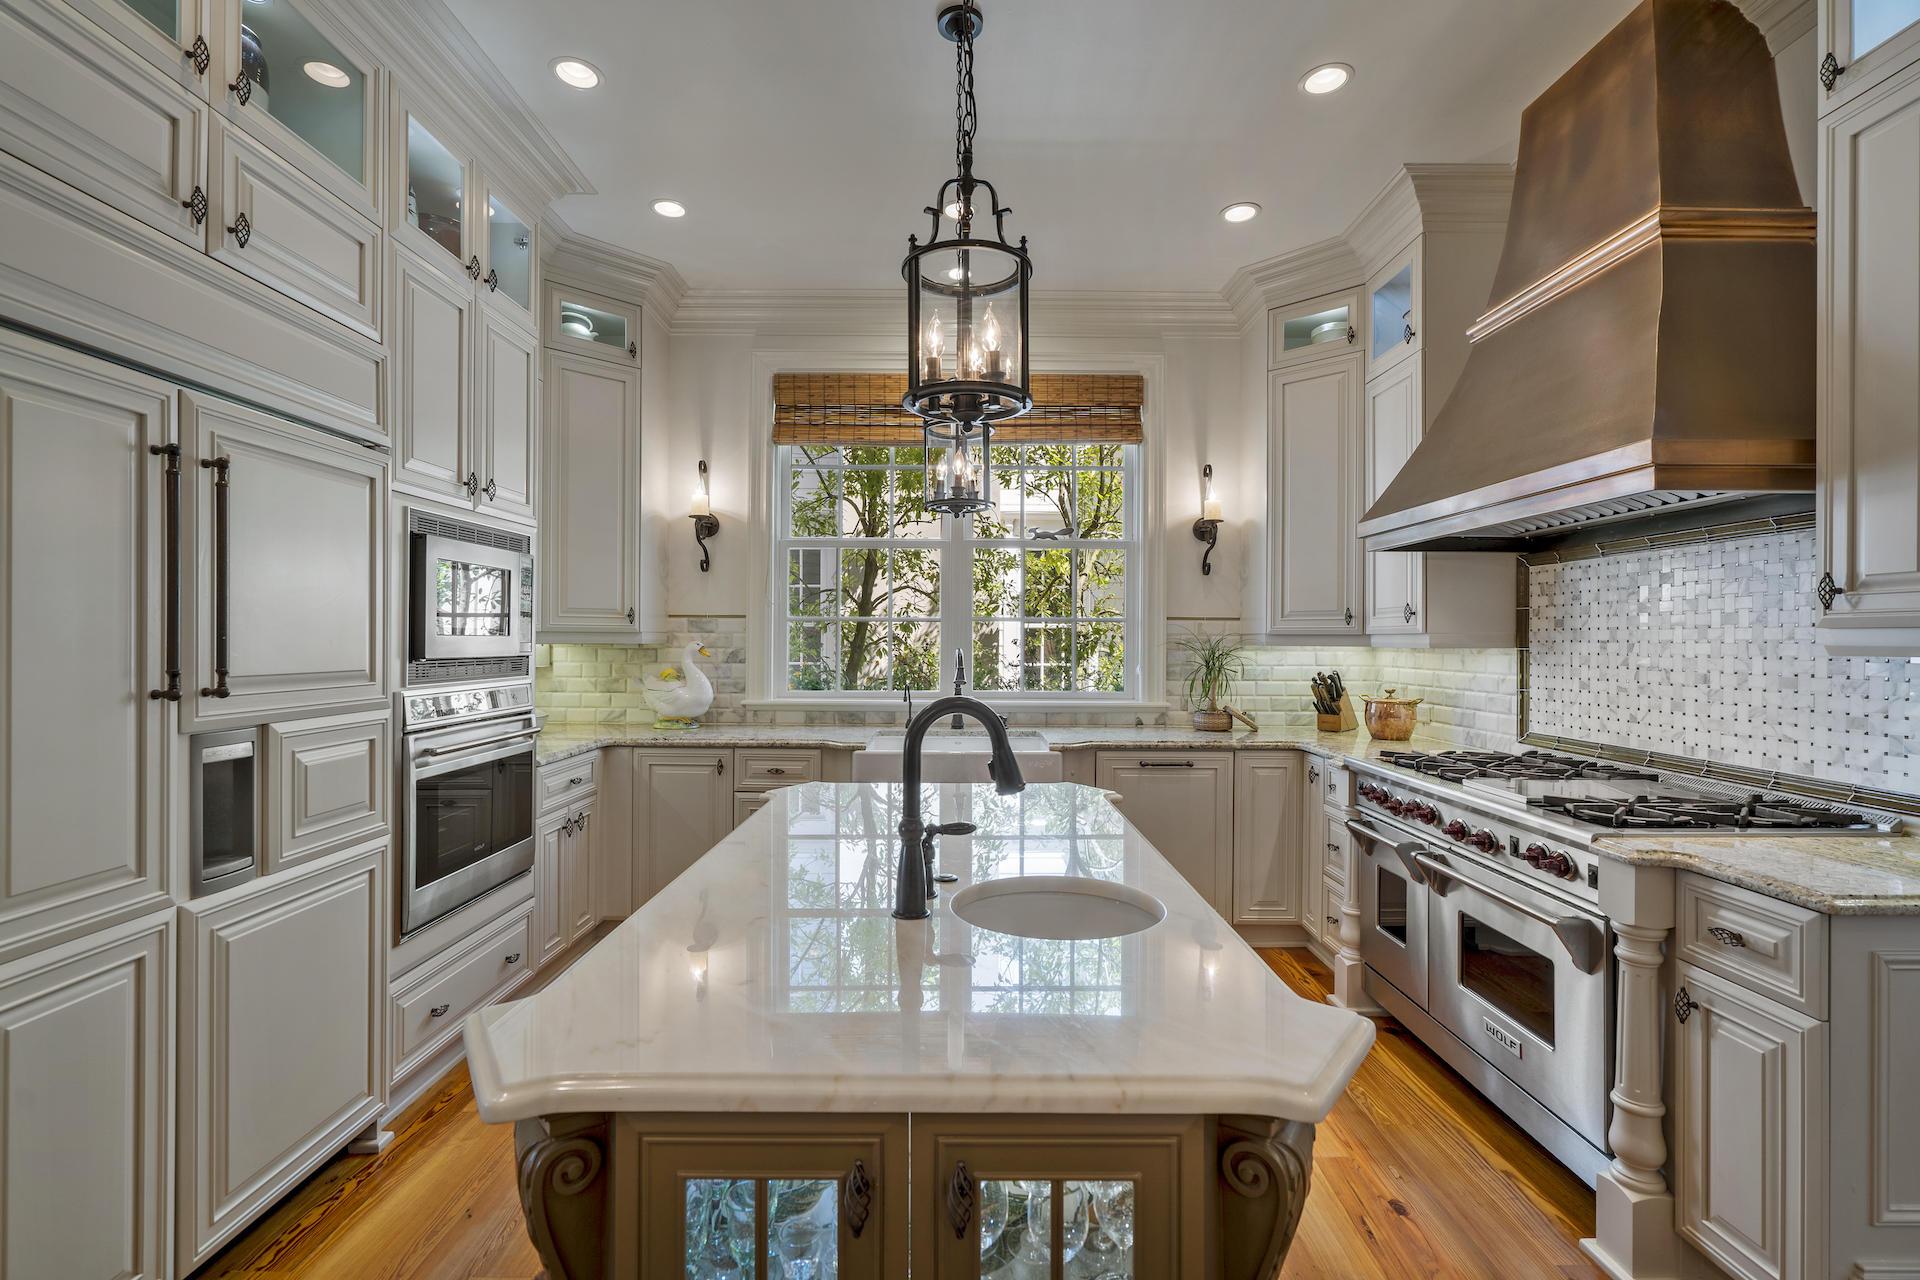 Daniel Island Homes For Sale - 623 Island Park, Charleston, SC - 37